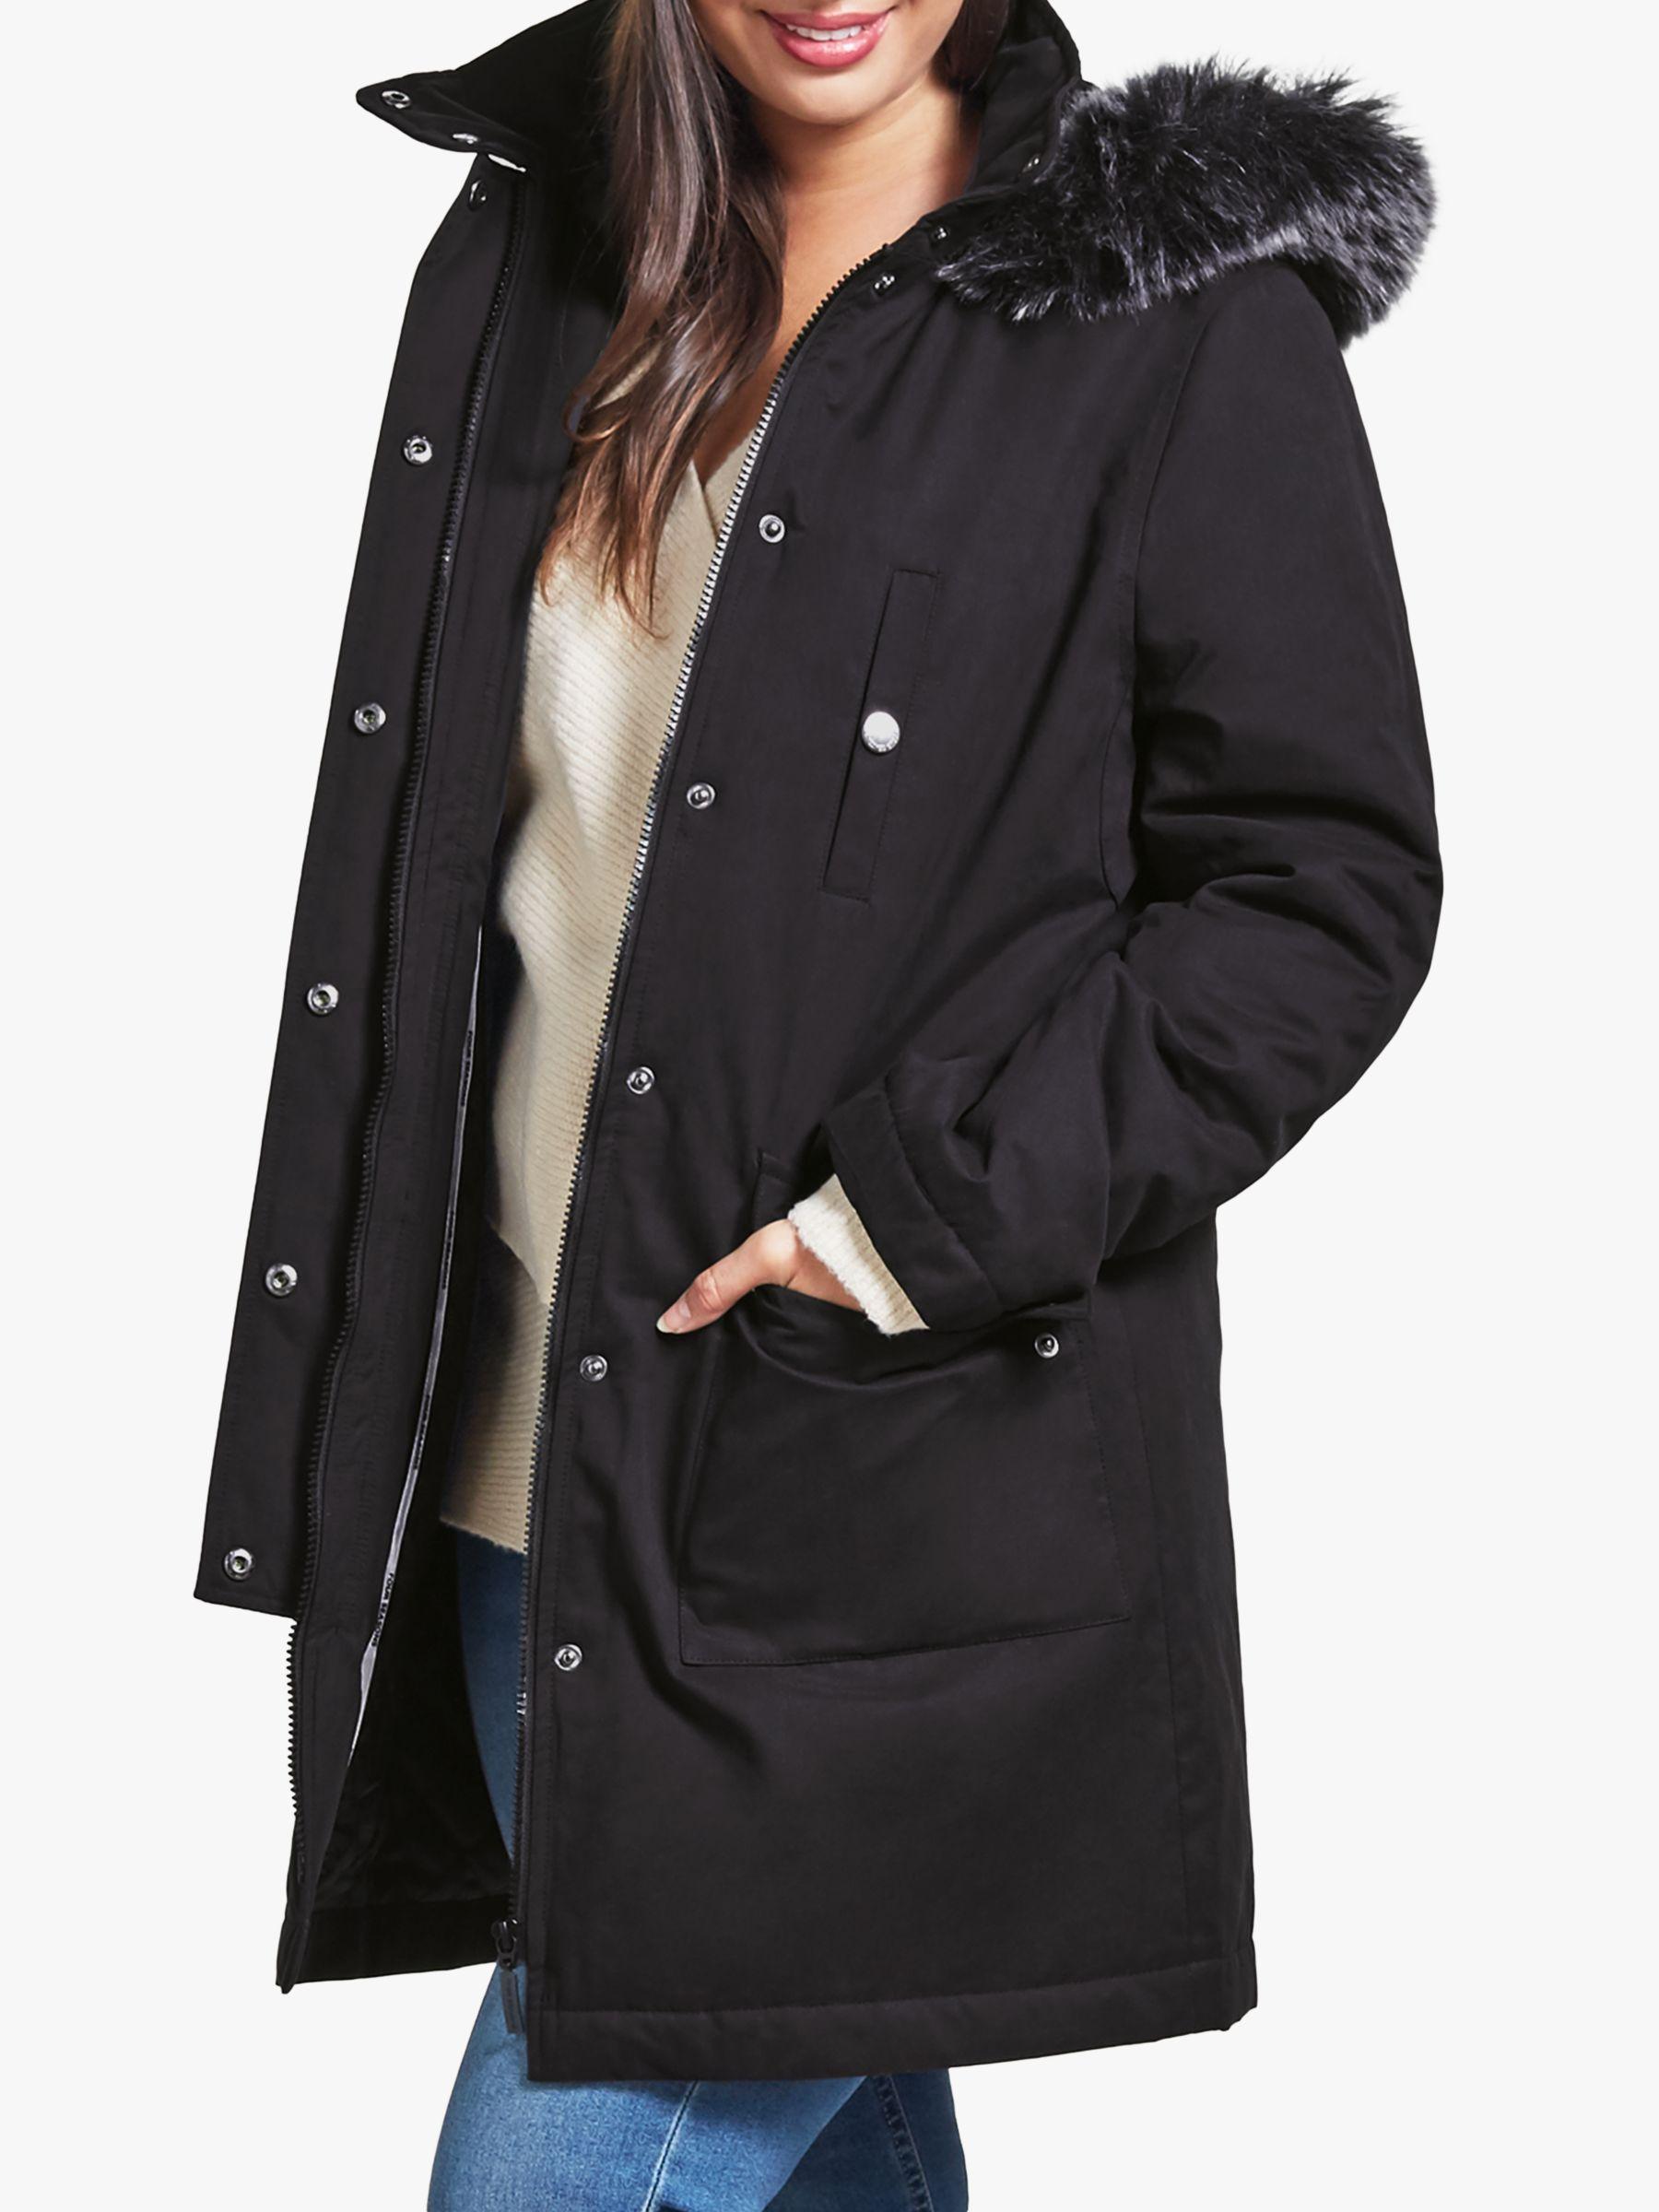 Four Seasons Four Seasons Caban Faux Fur Trim Coat